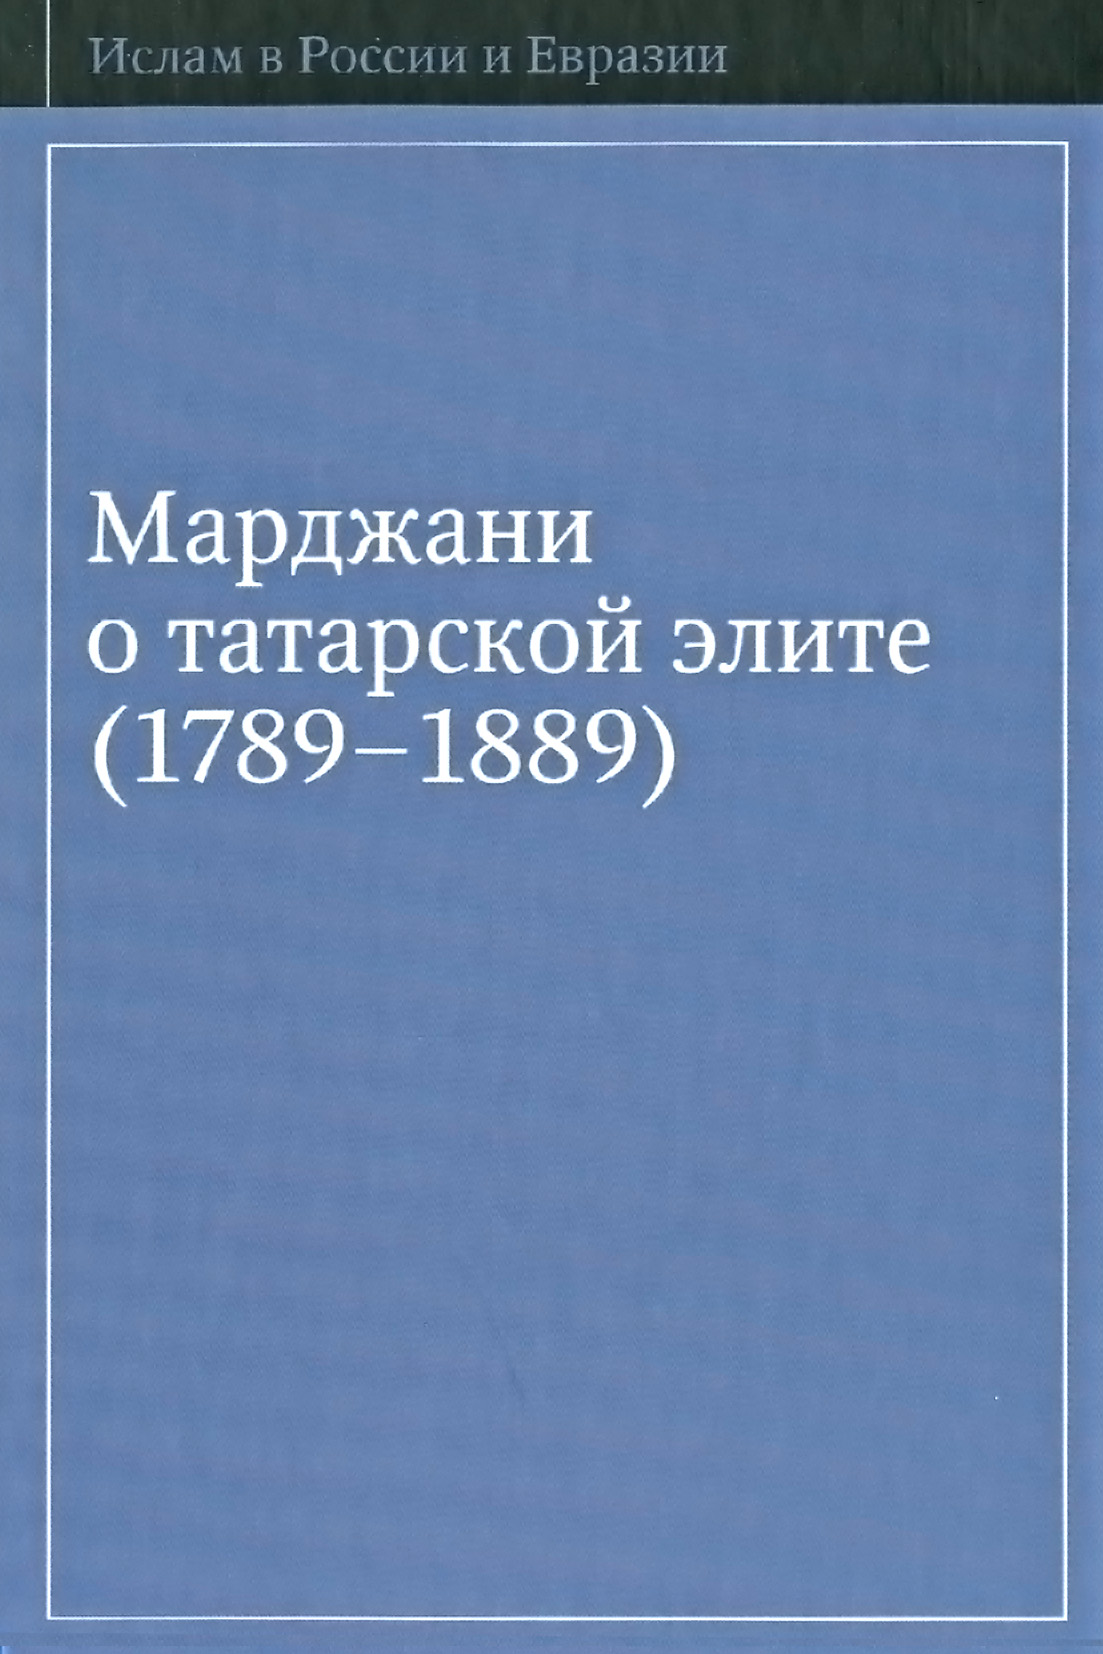 Марджани о татарской элите (1789–1889)